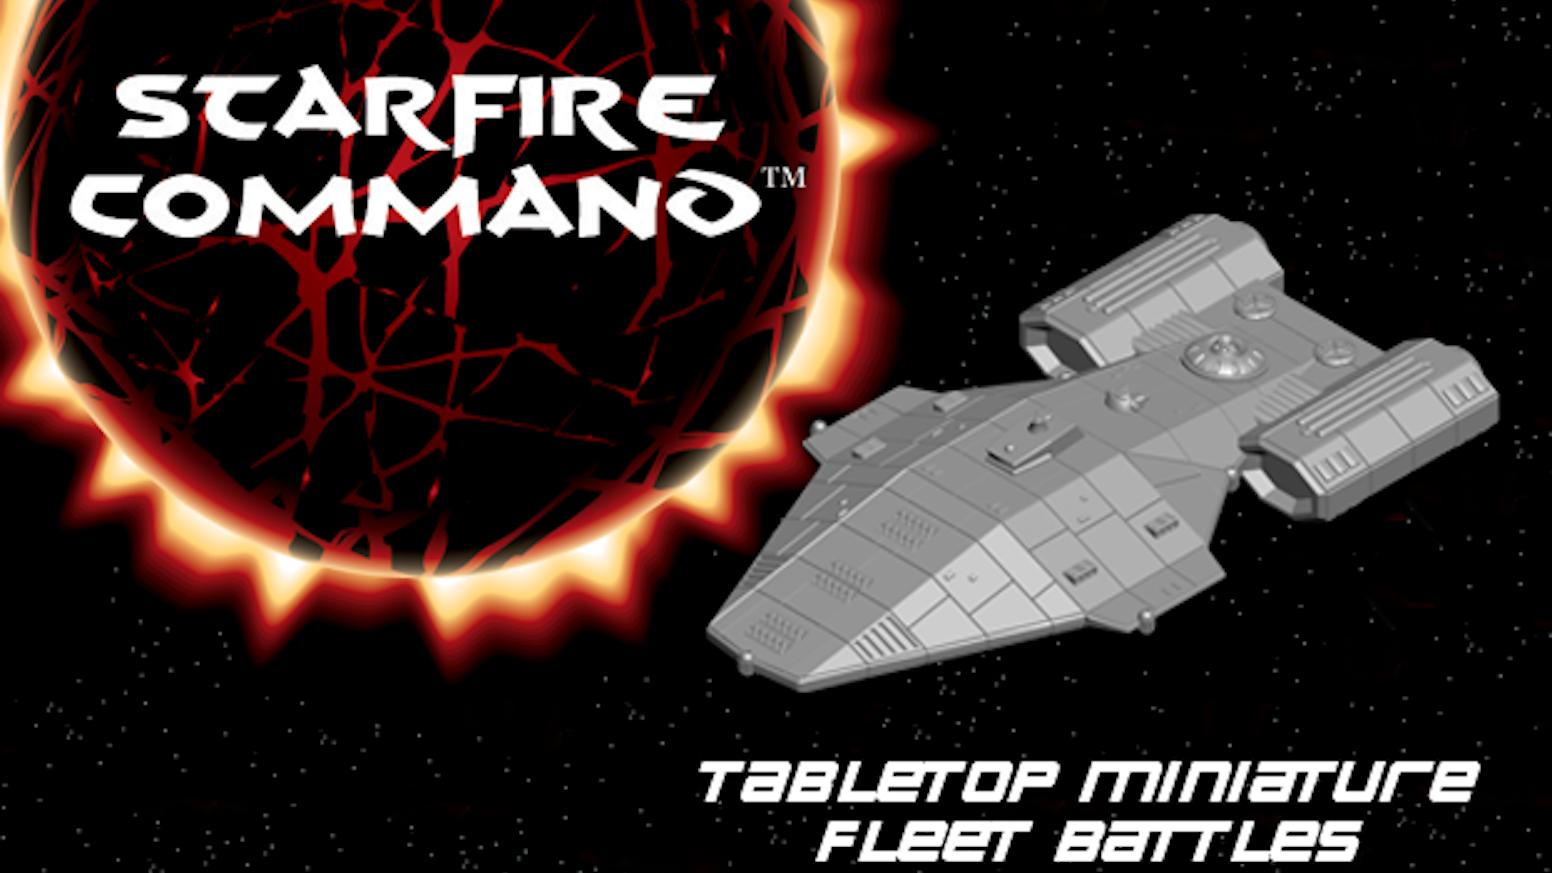 StarFire Command Space Fleet Miniatures War Game by Brad